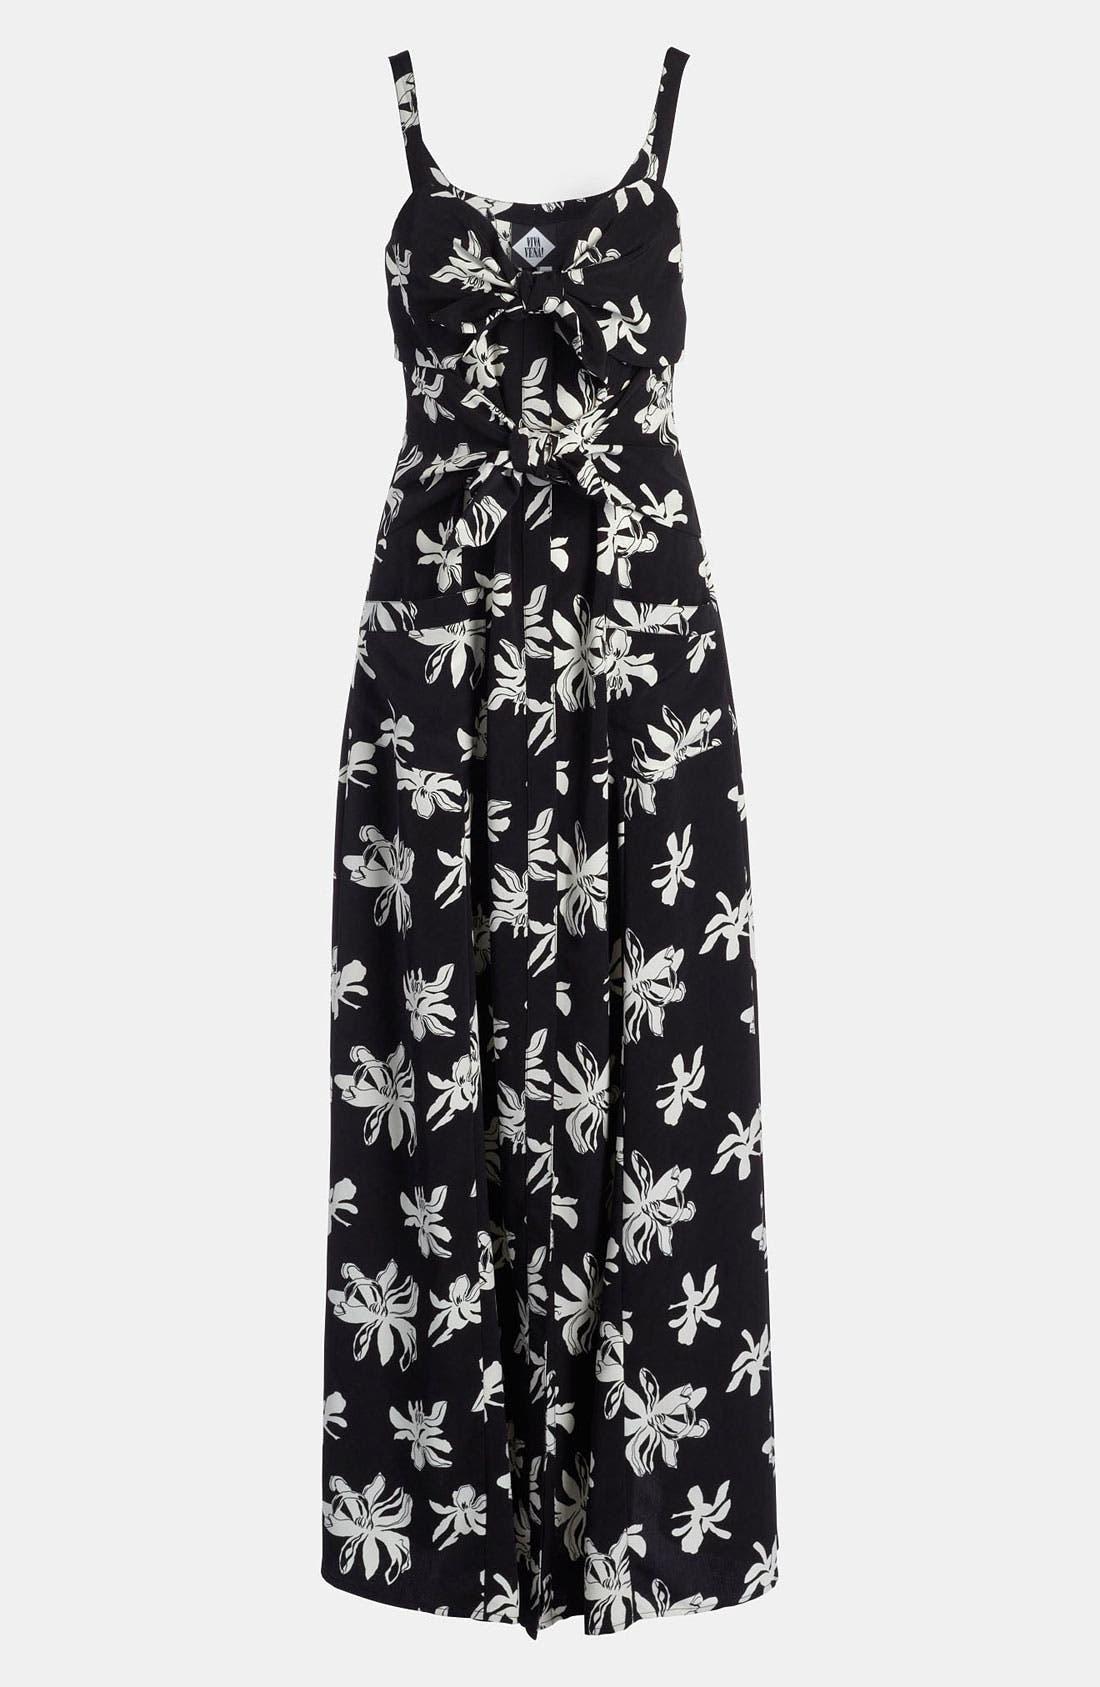 Main Image - Viva Vena! 'Art Collector' Dress